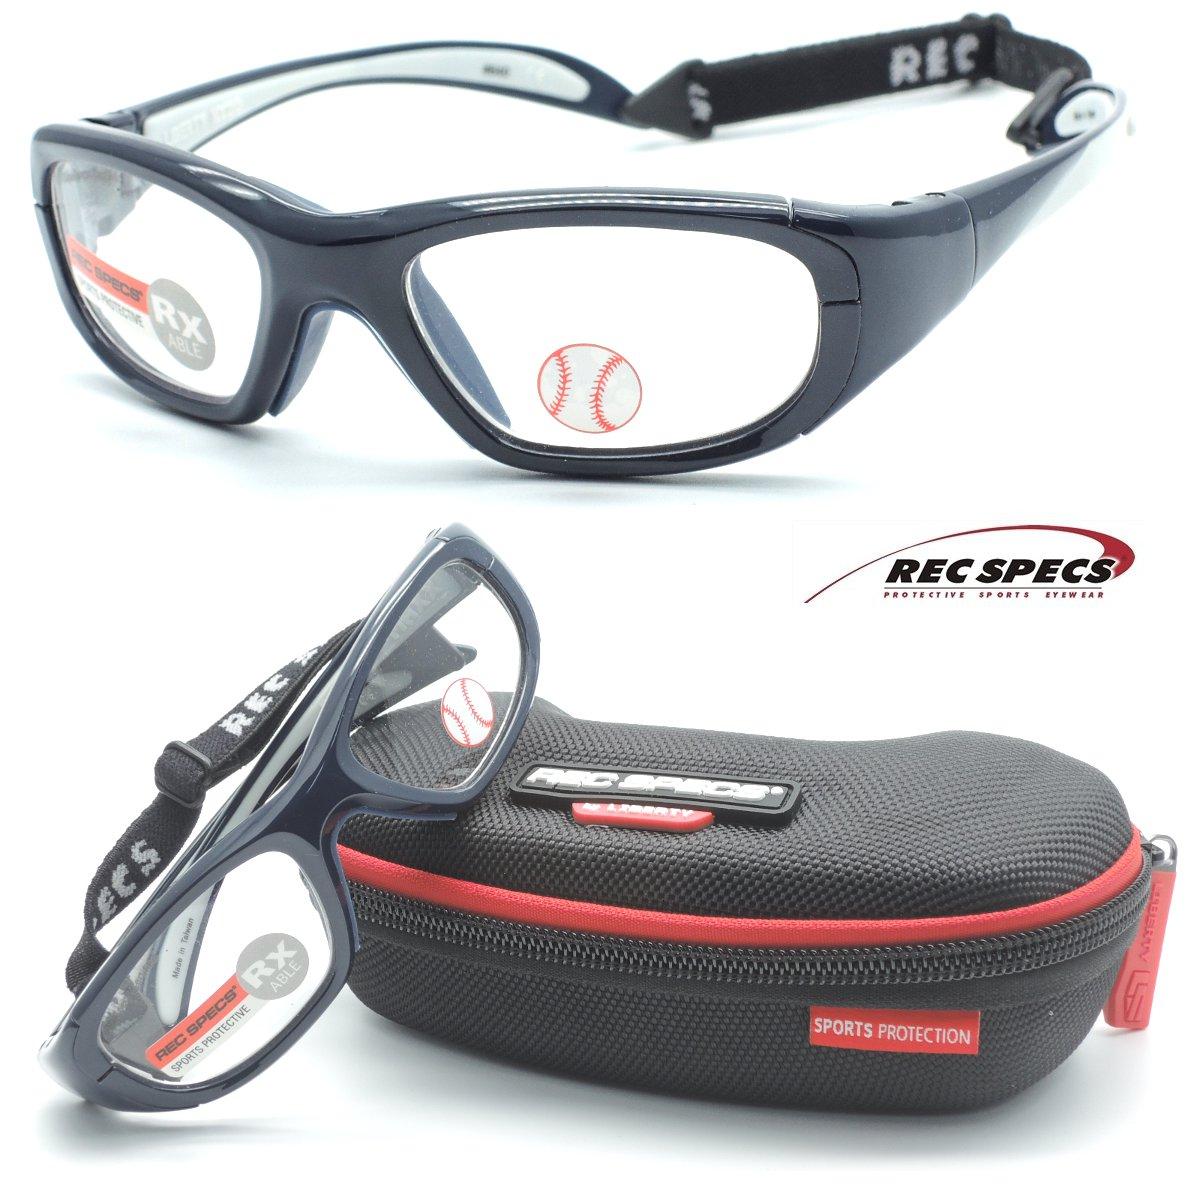 【REC SPECS】 レックスペックス MX-20B #640 ネイビー 子供用スポーツアイウエア 度付レンズ込【正規品】【店内全品送料無料】スポーツゴーグル カッコイイキッズメガネ